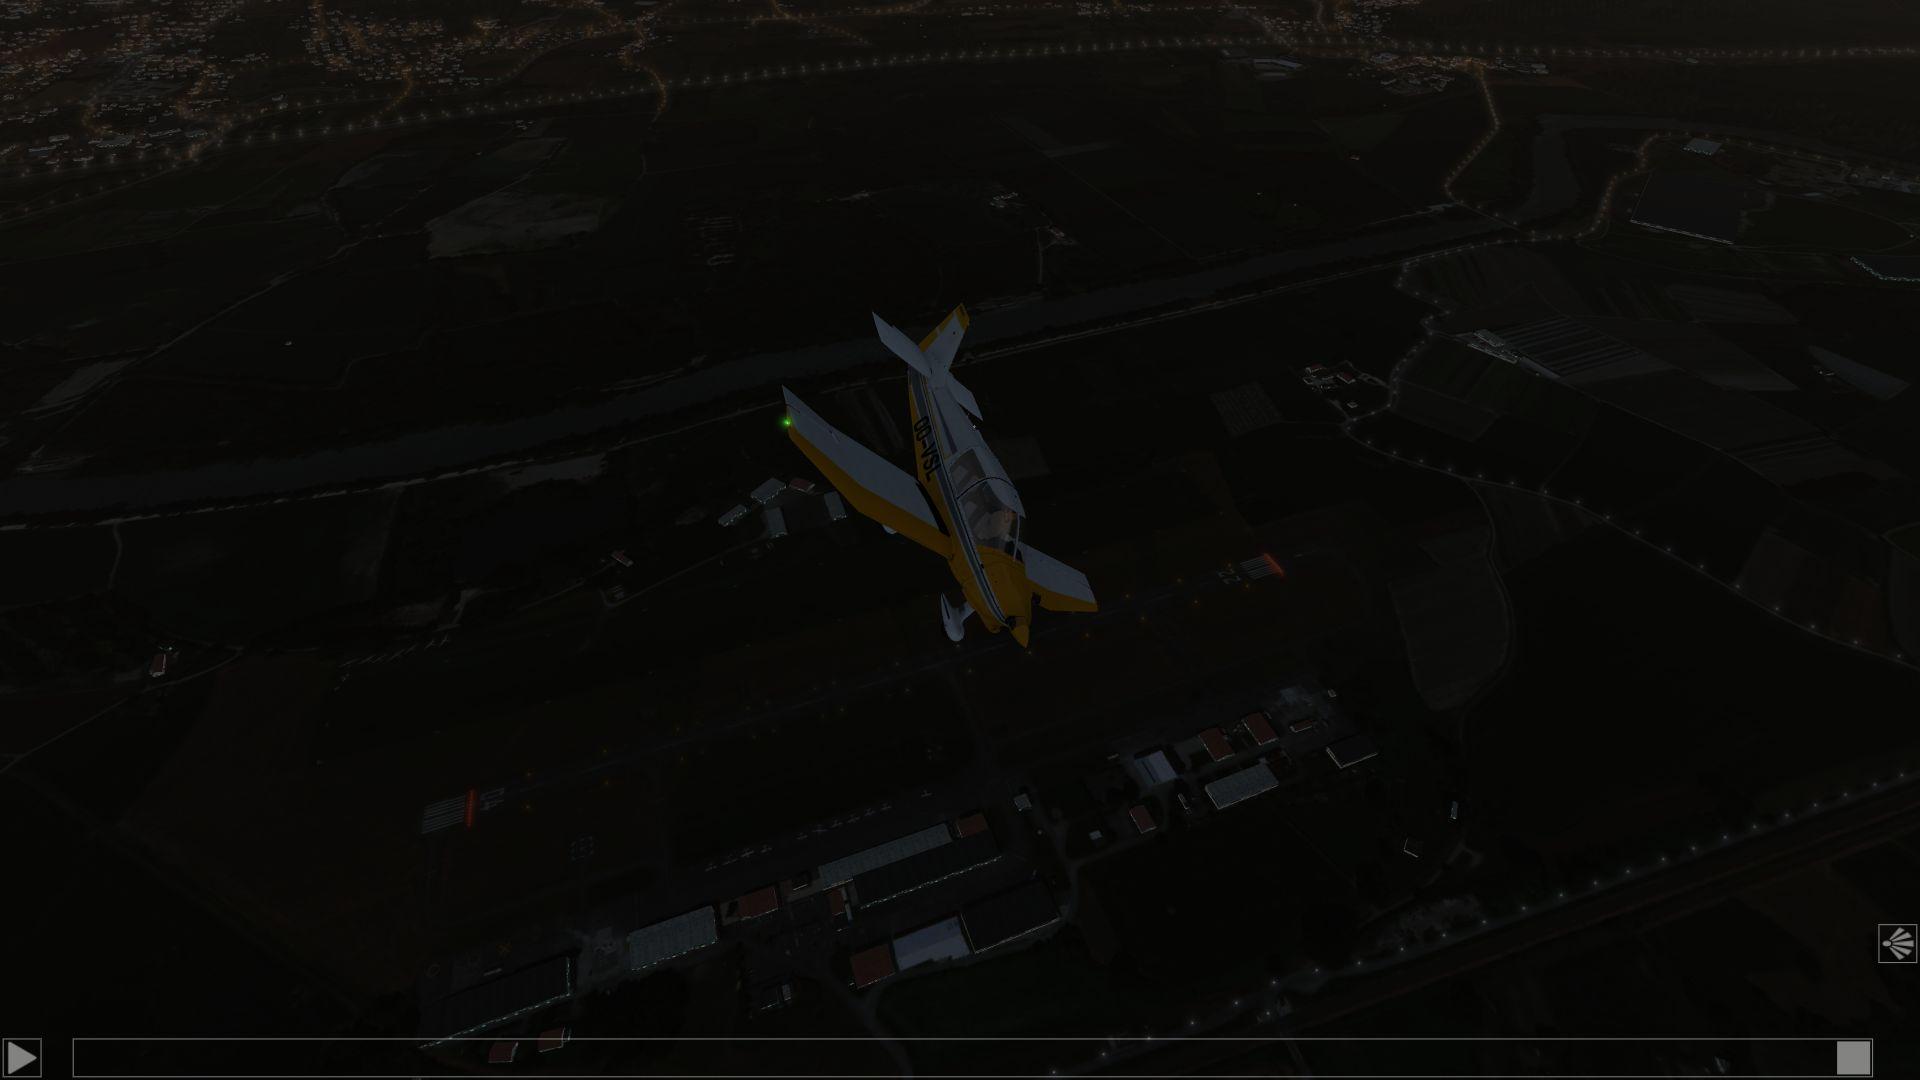 http://www.pilote-virtuel.com/img/gallery/1517250678.jpg